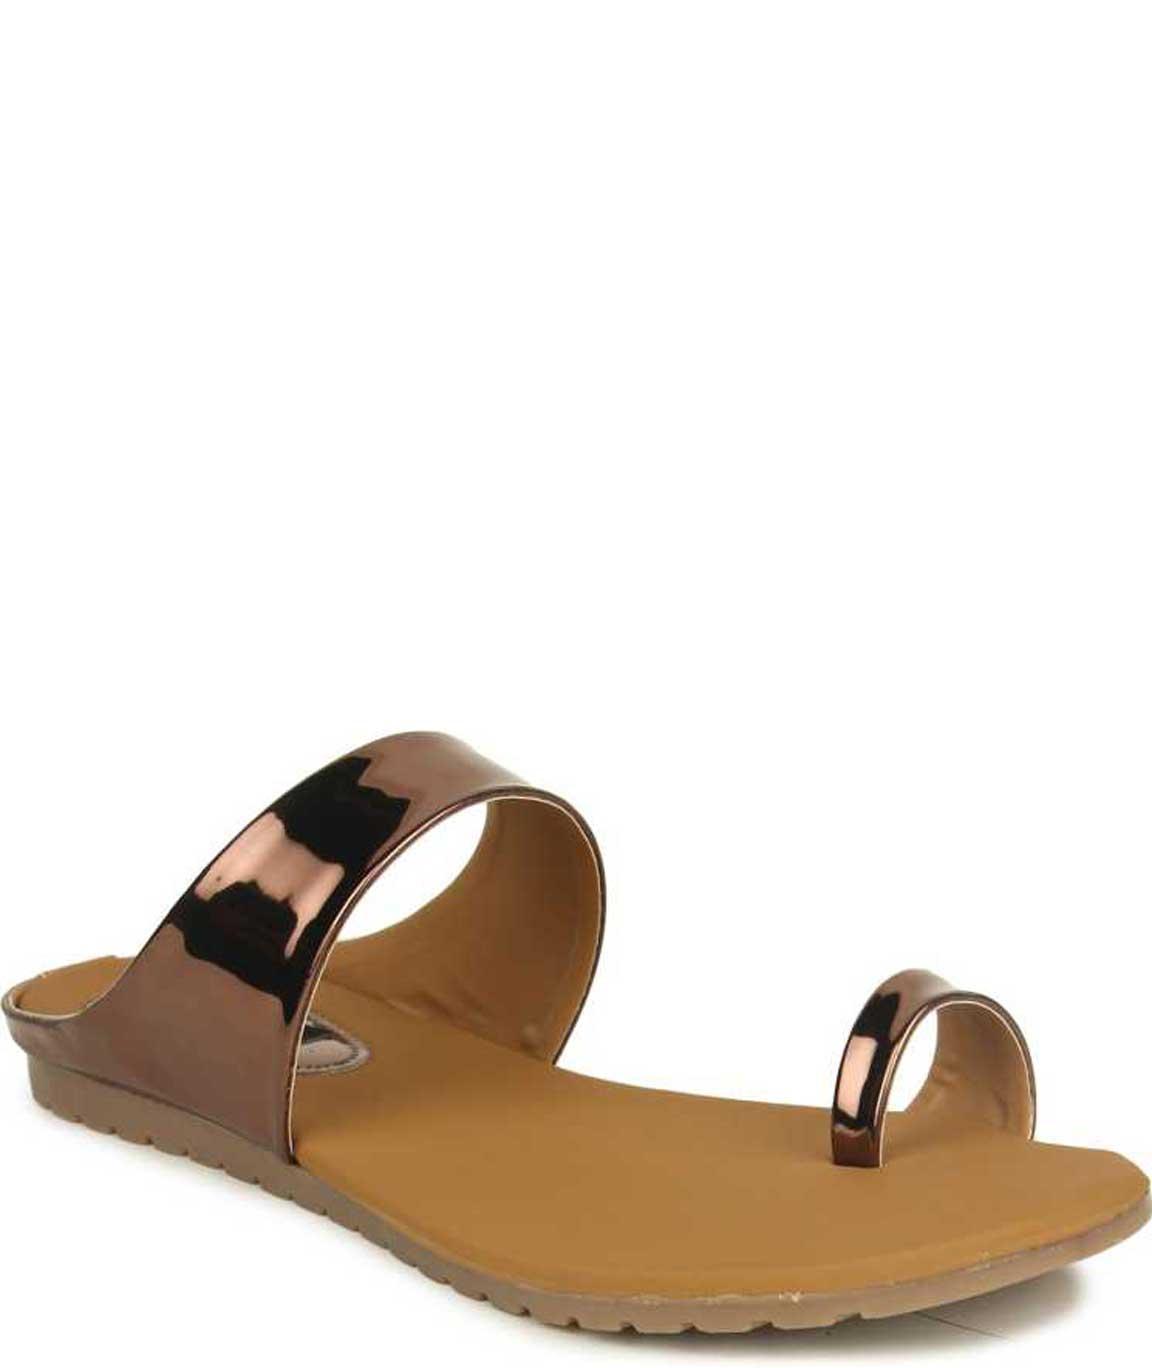 WOMEN COPPER SLIP-ON FLATS